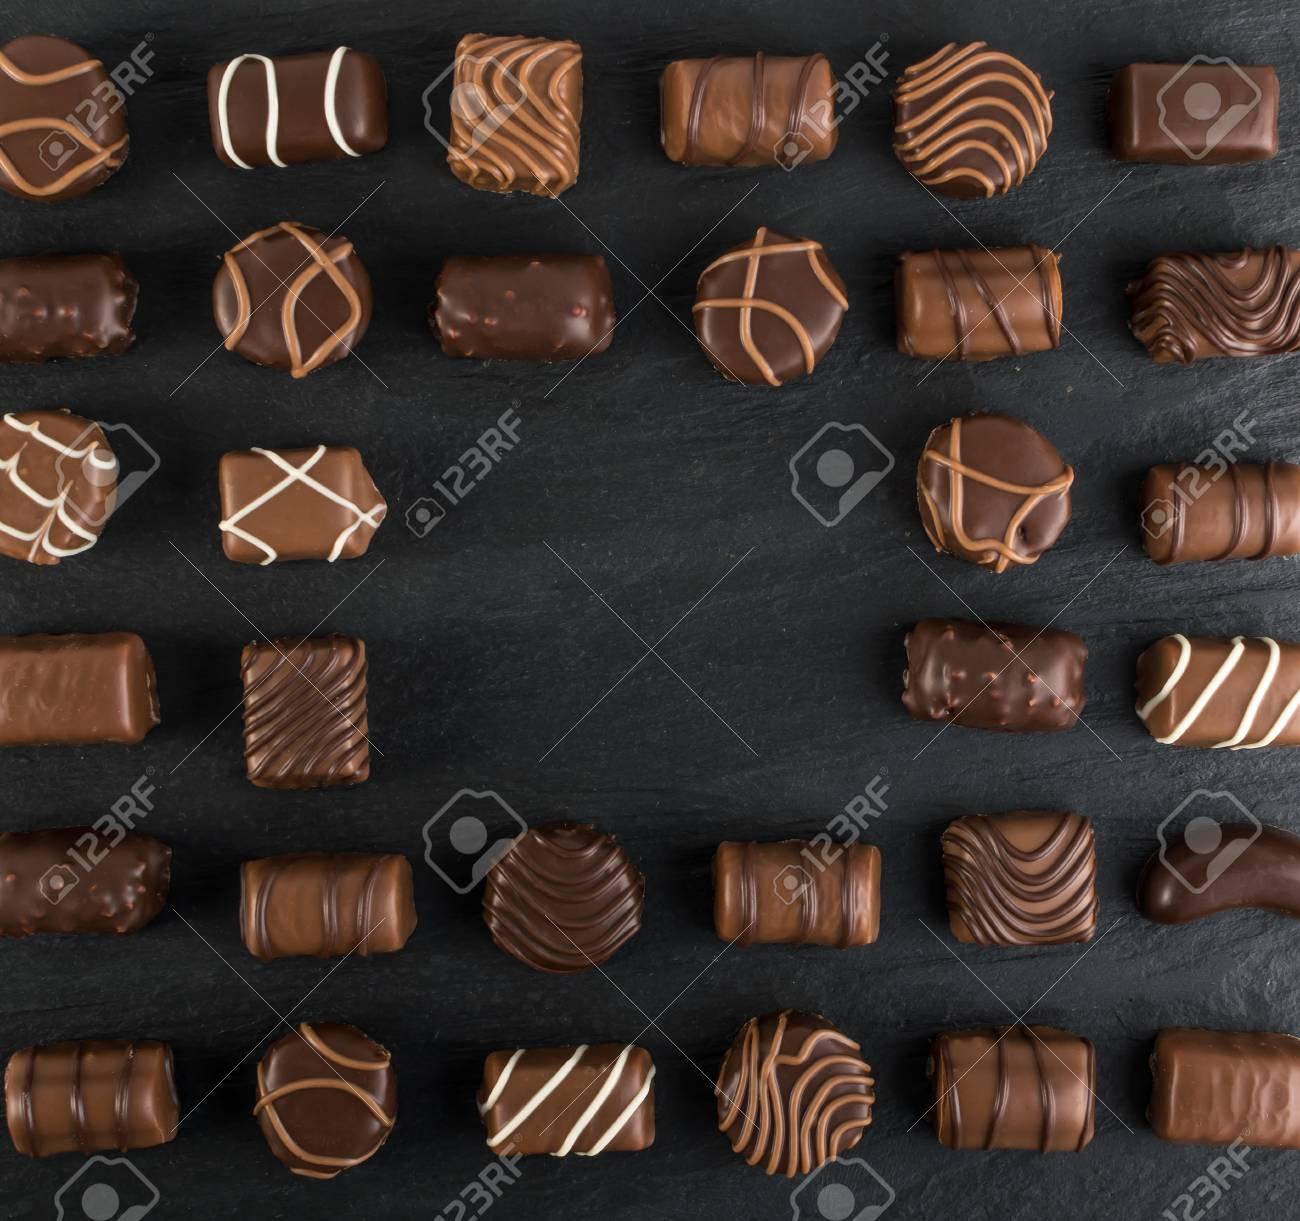 Beautiful Creative Chocolate Sweets On Natural Black Stone